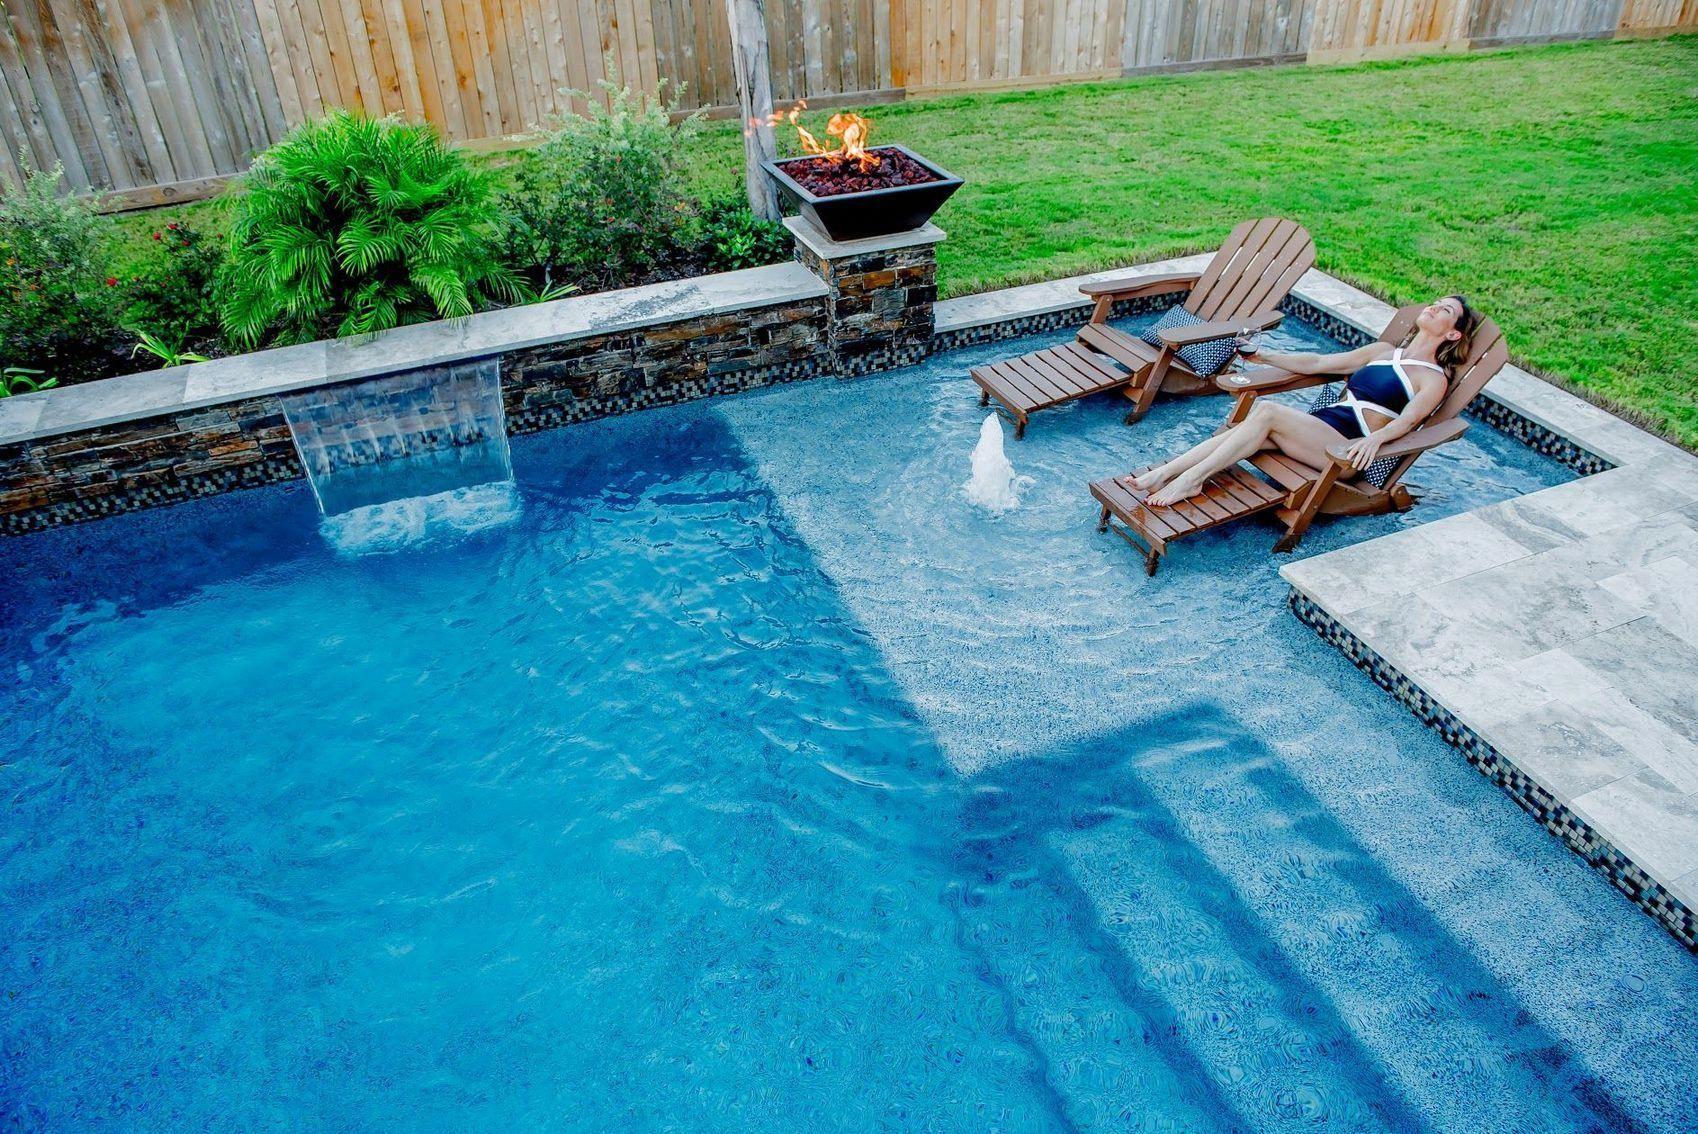 25 Admirable Stock Tank Swimming Pool Design Ideas Tank Swimmingpooldesign Designideas Stock Tank Swimming Pool Diy Swimming Pool Small Backyard Pools